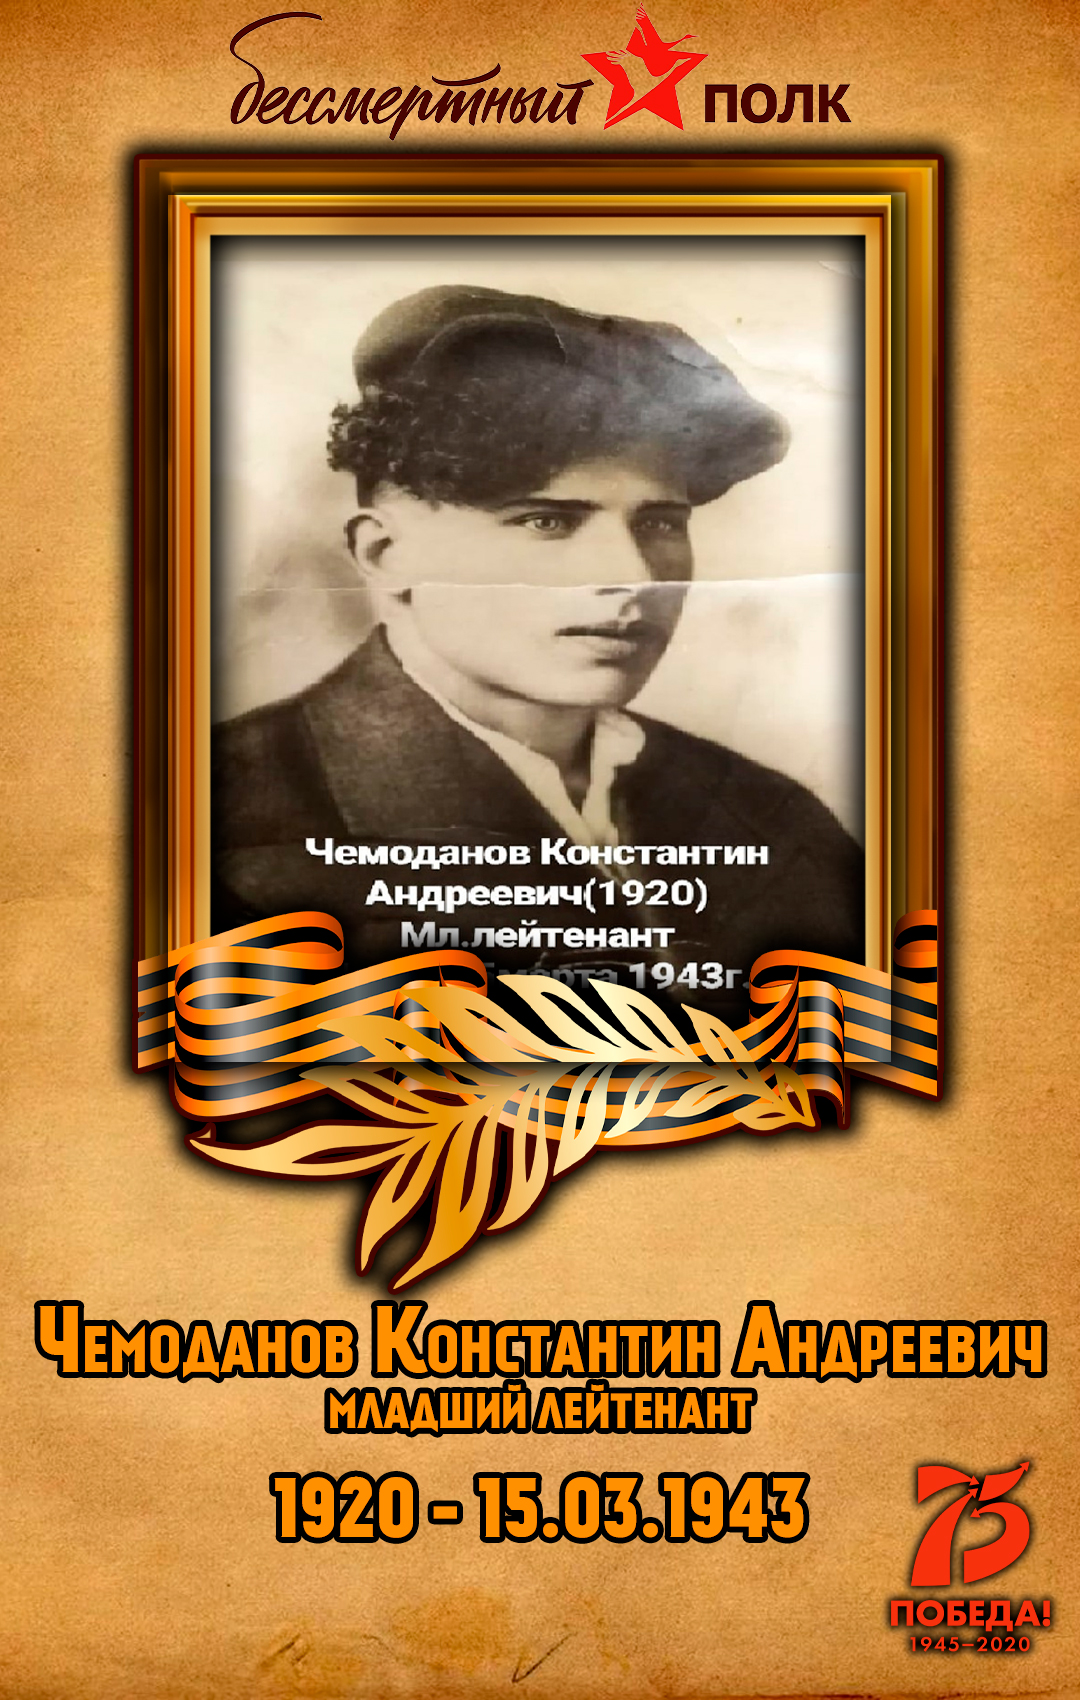 Чемоданов-Константин-Андреевич